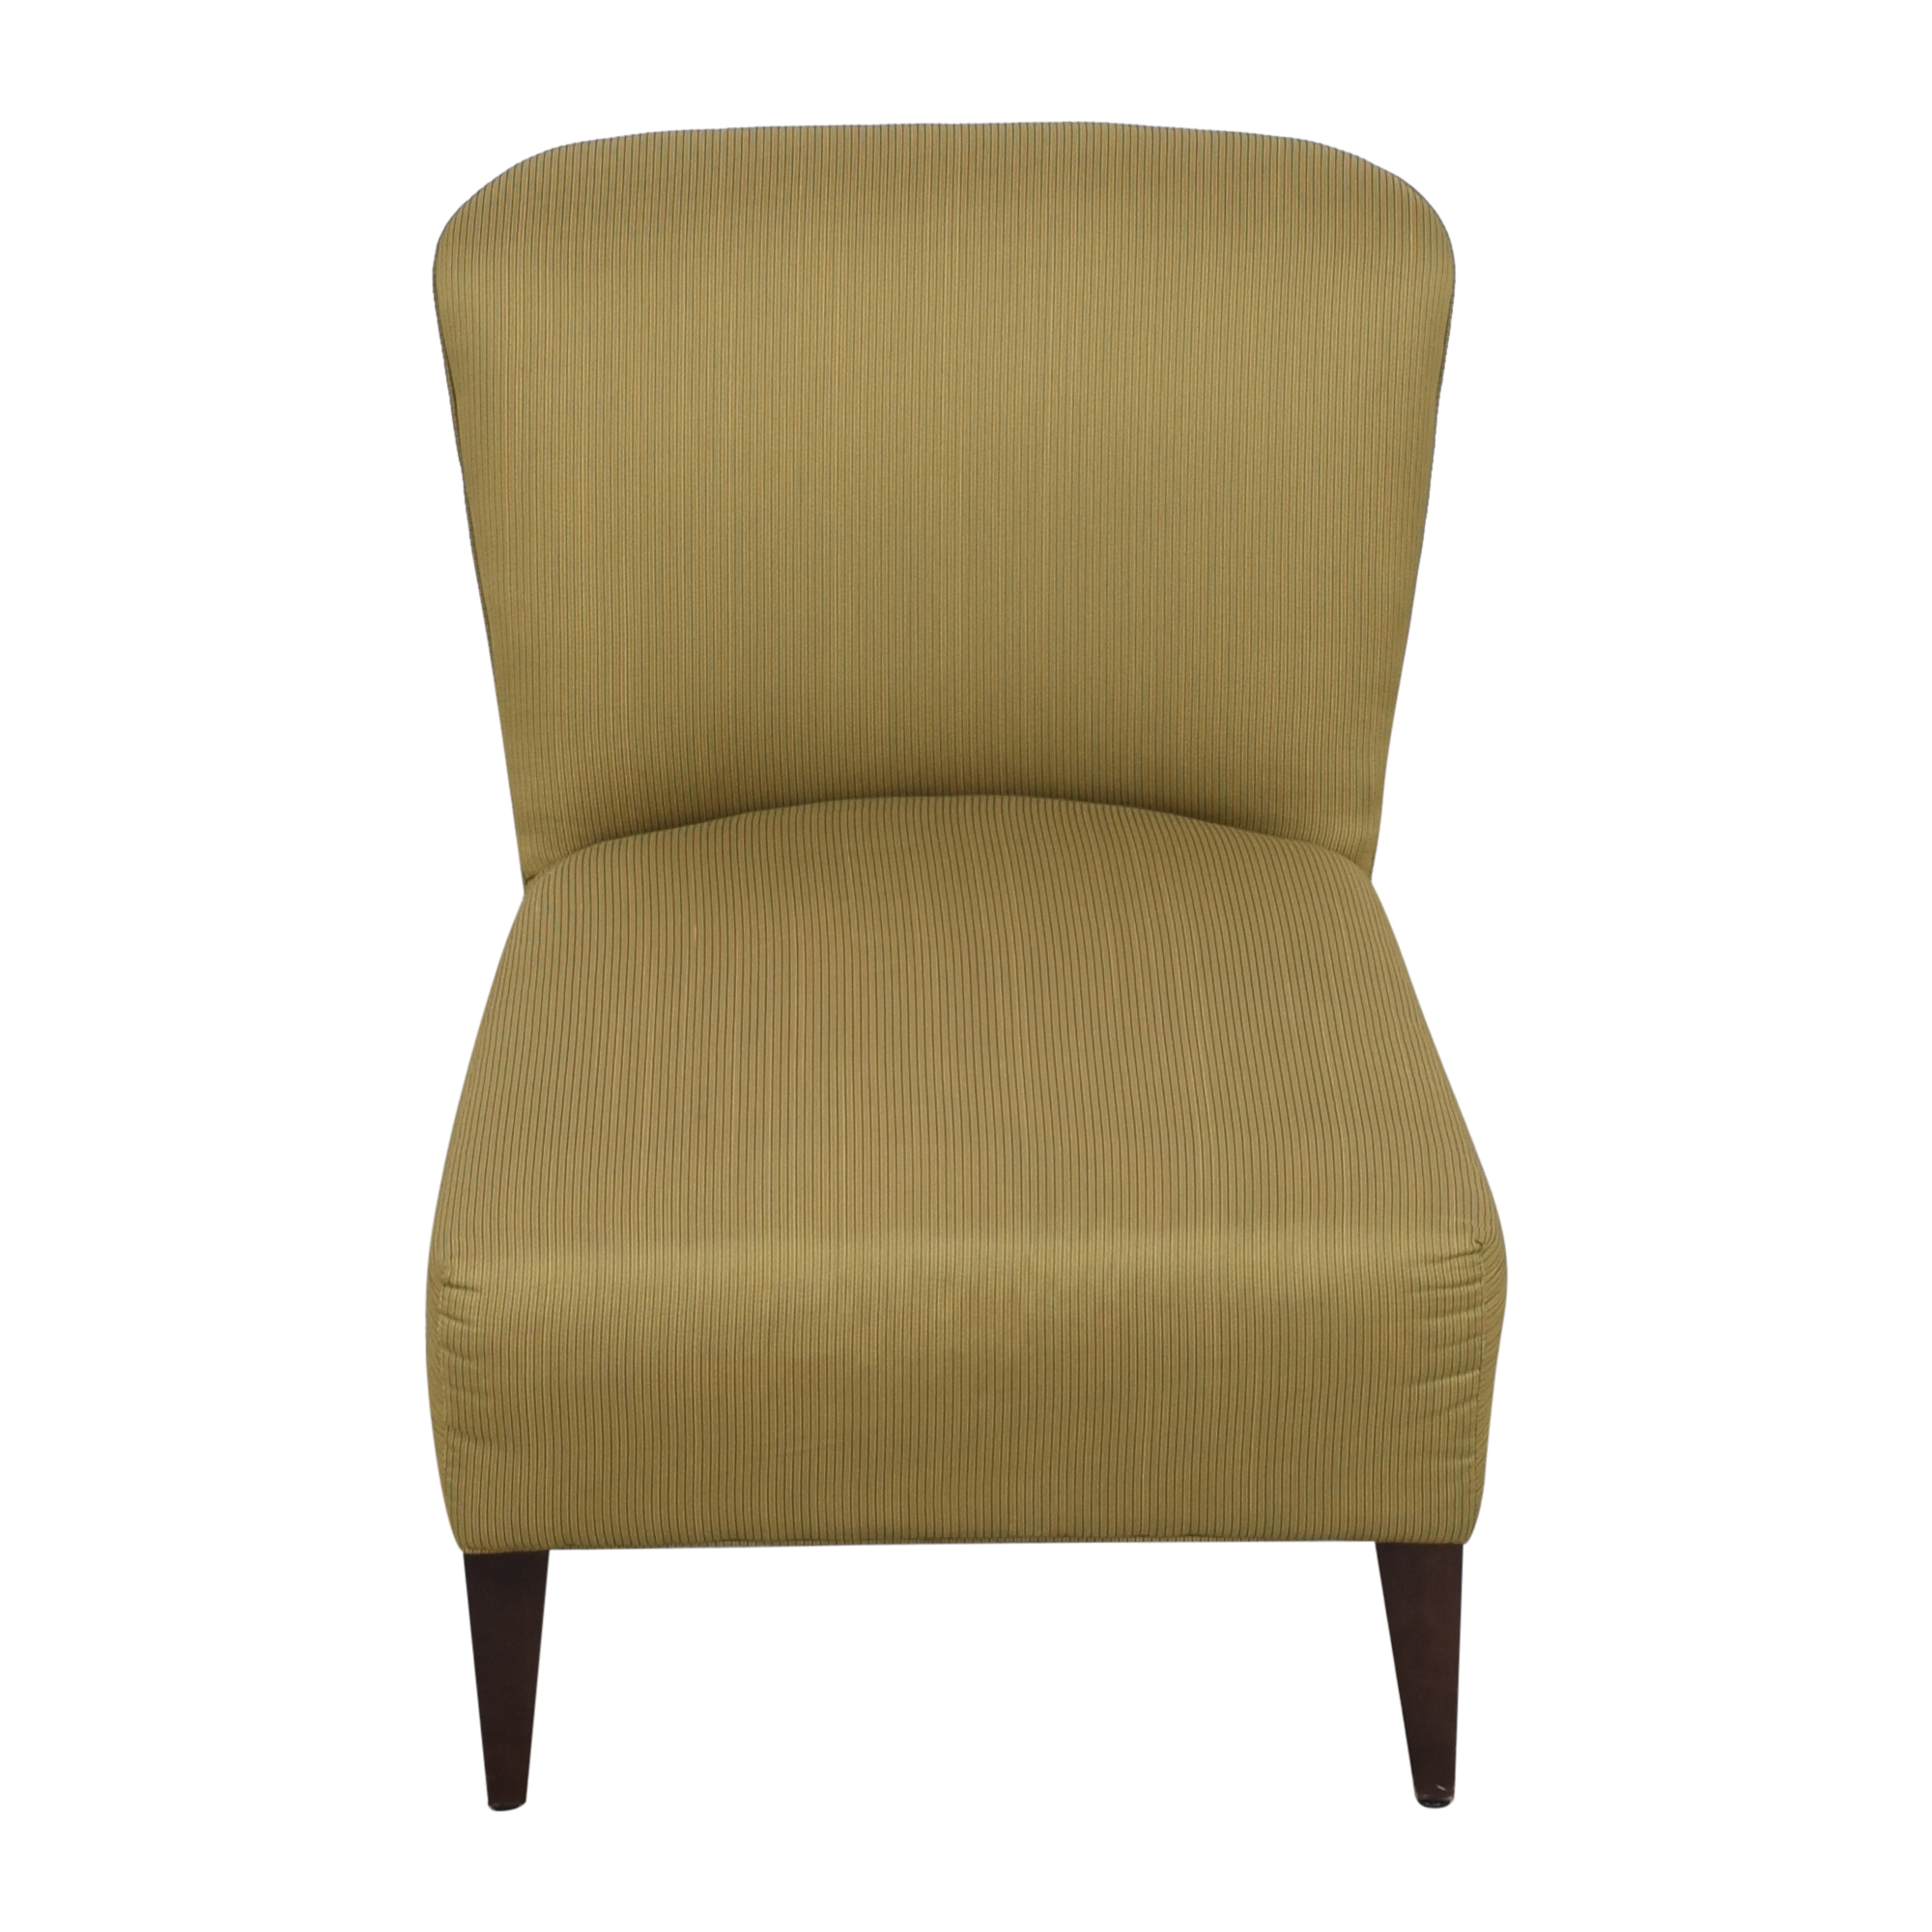 shop Restoration Hardware Slipper Style Accent Chair Restoration Hardware Chairs